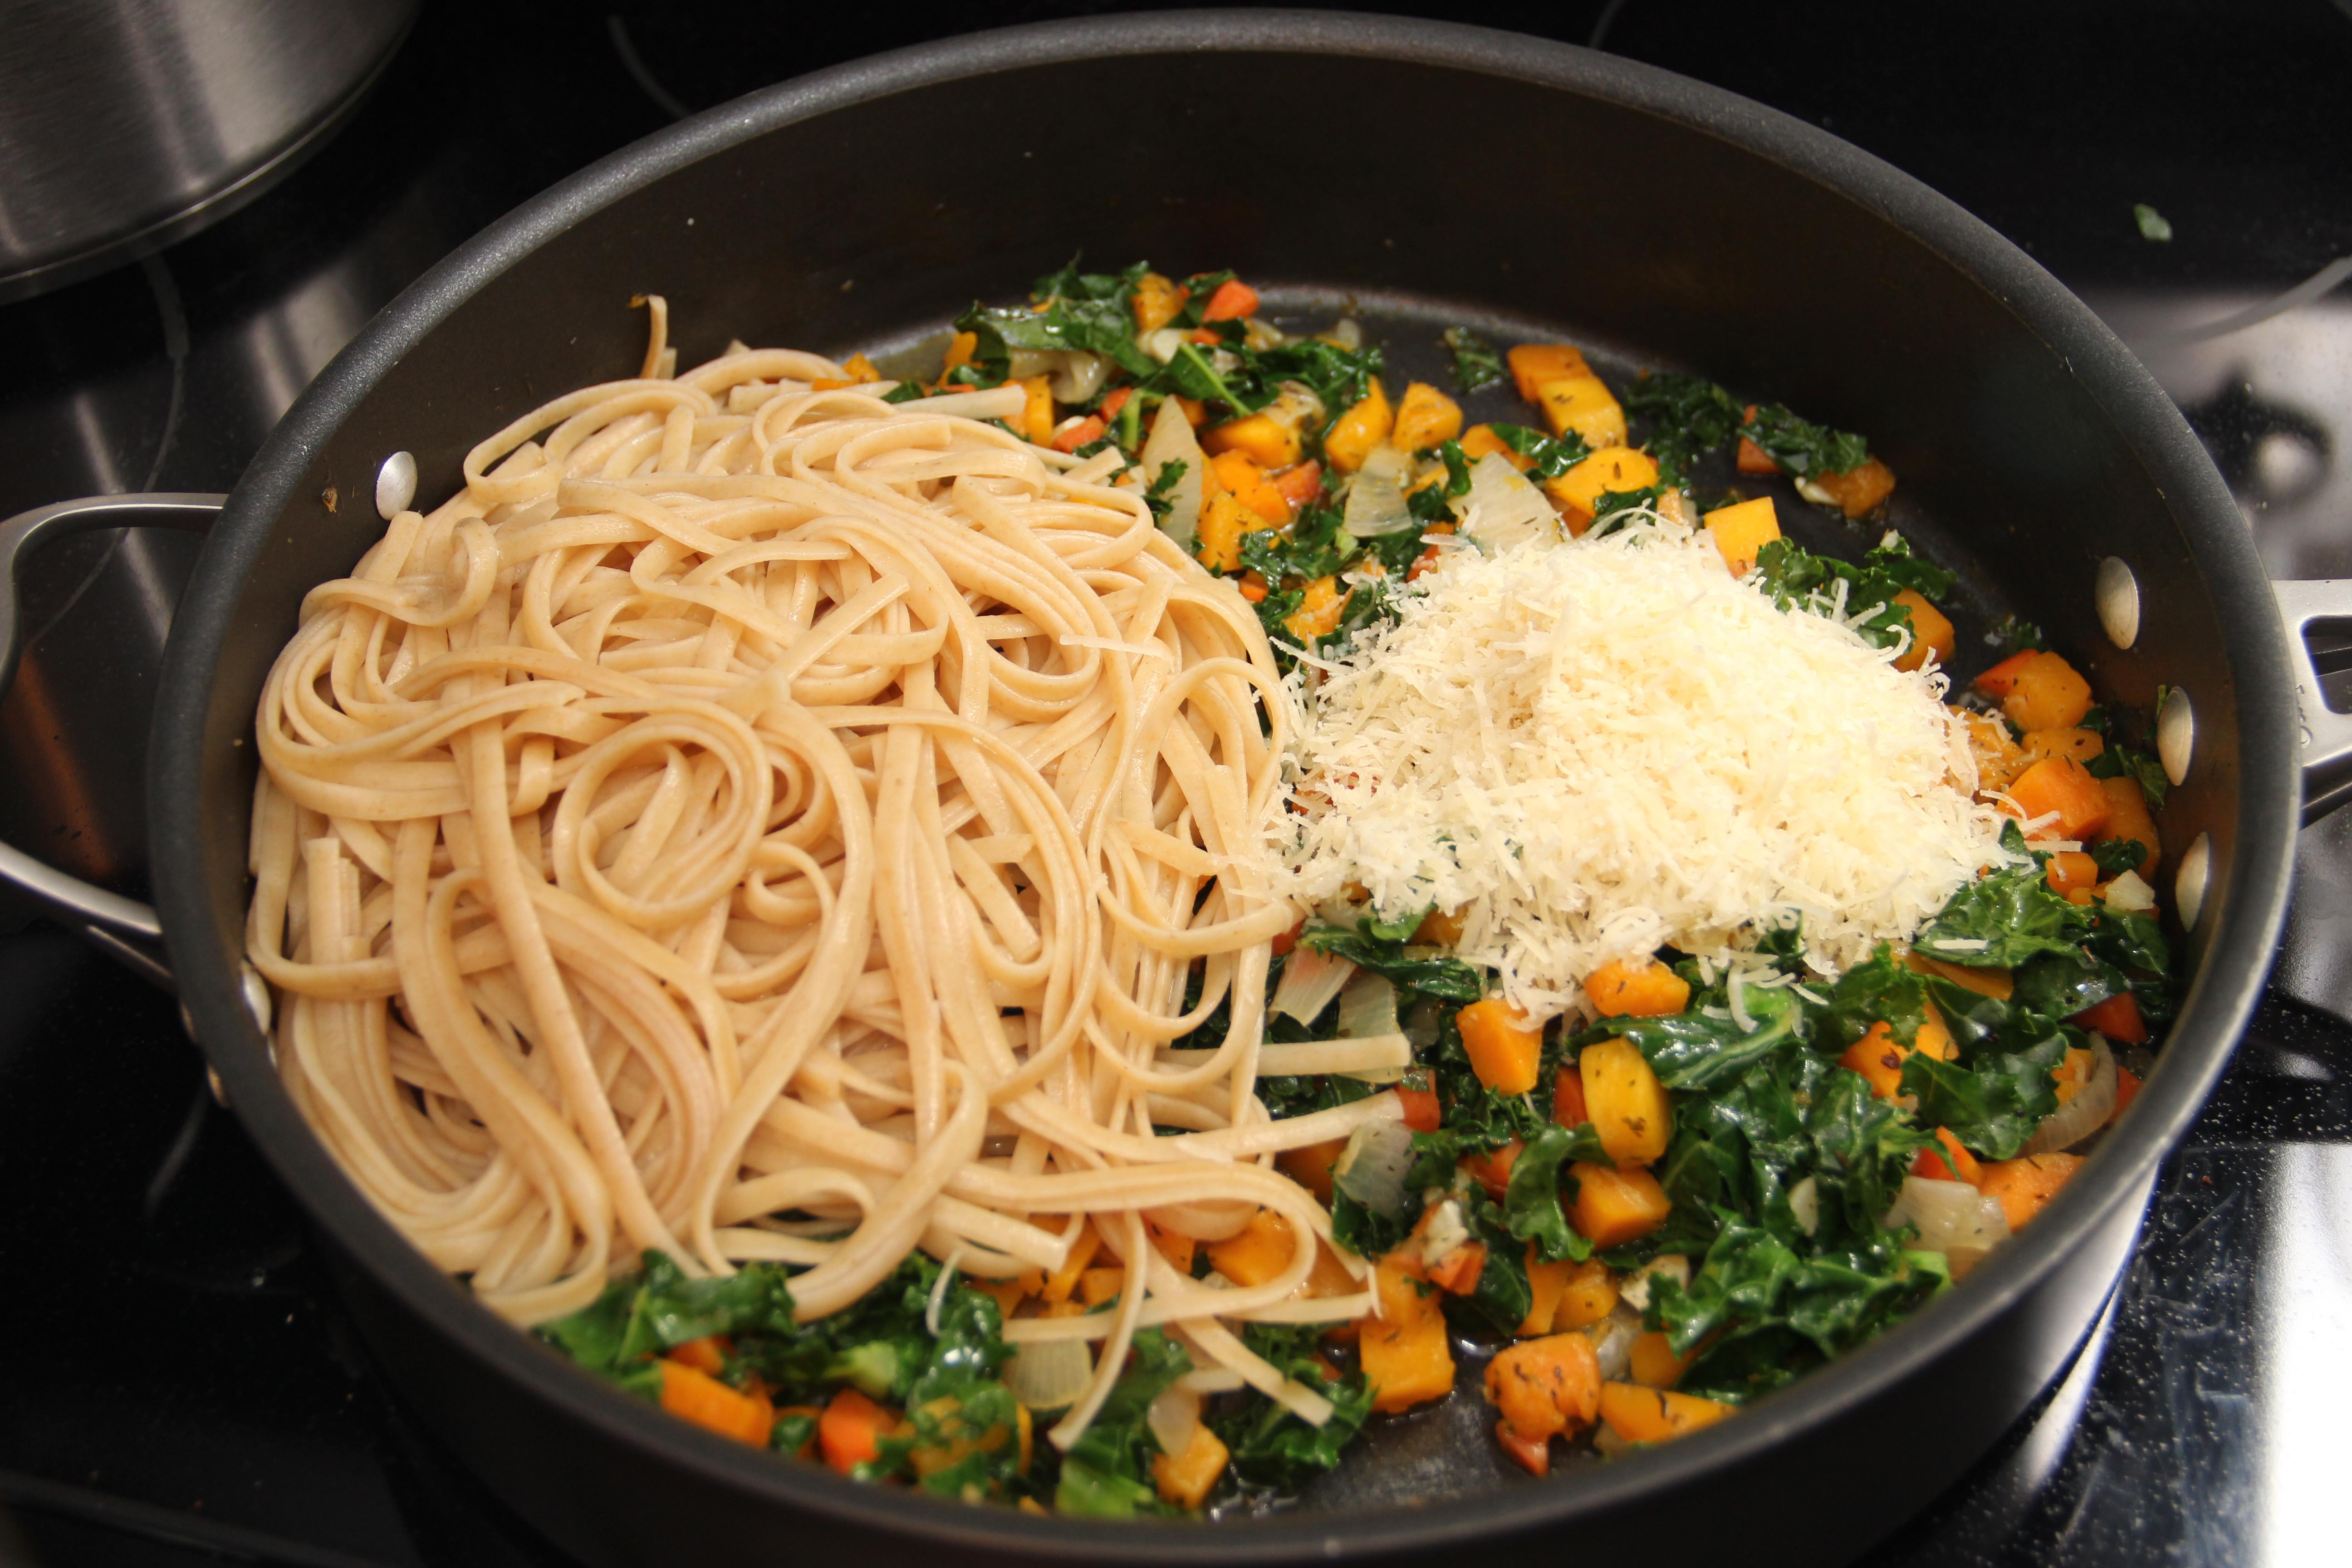 Healthy Vegetarian Pasta Recipes  healthy ve able pasta recipes